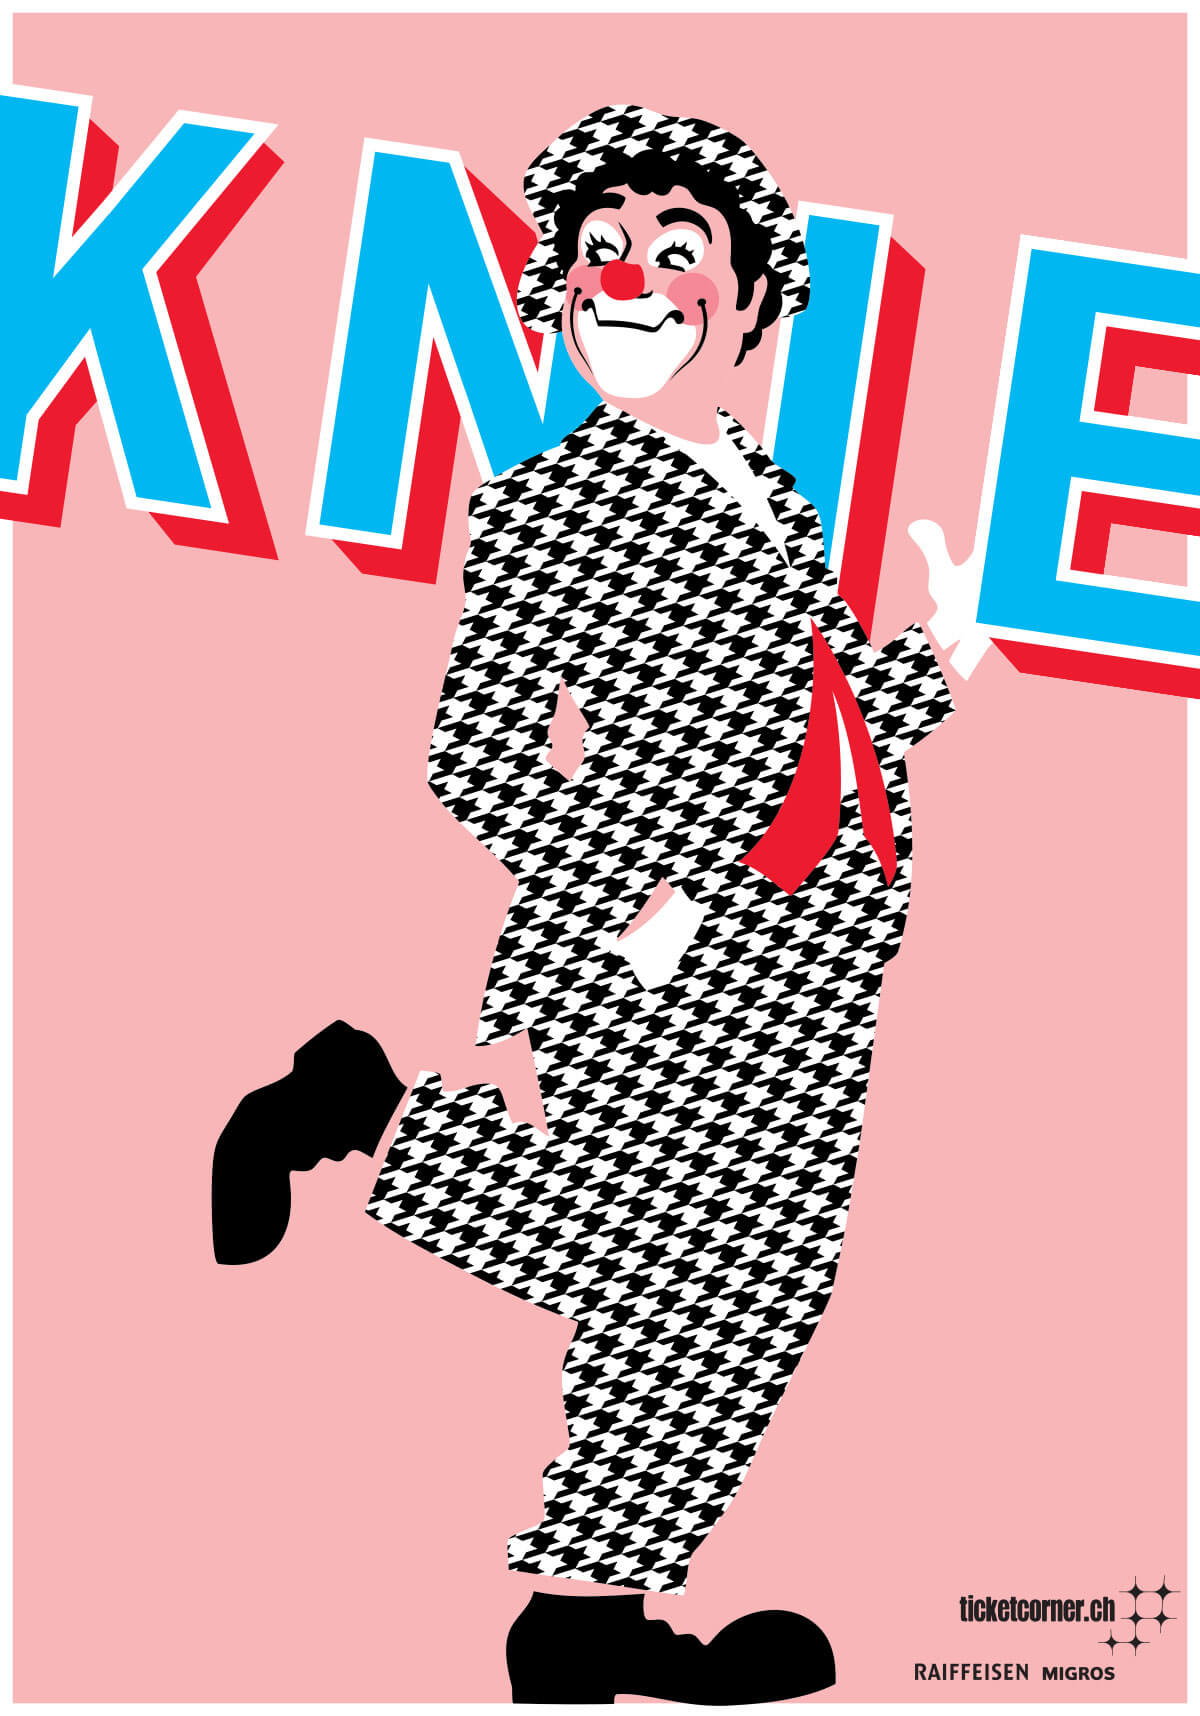 Circus Knie – Jahresmotiv 2016